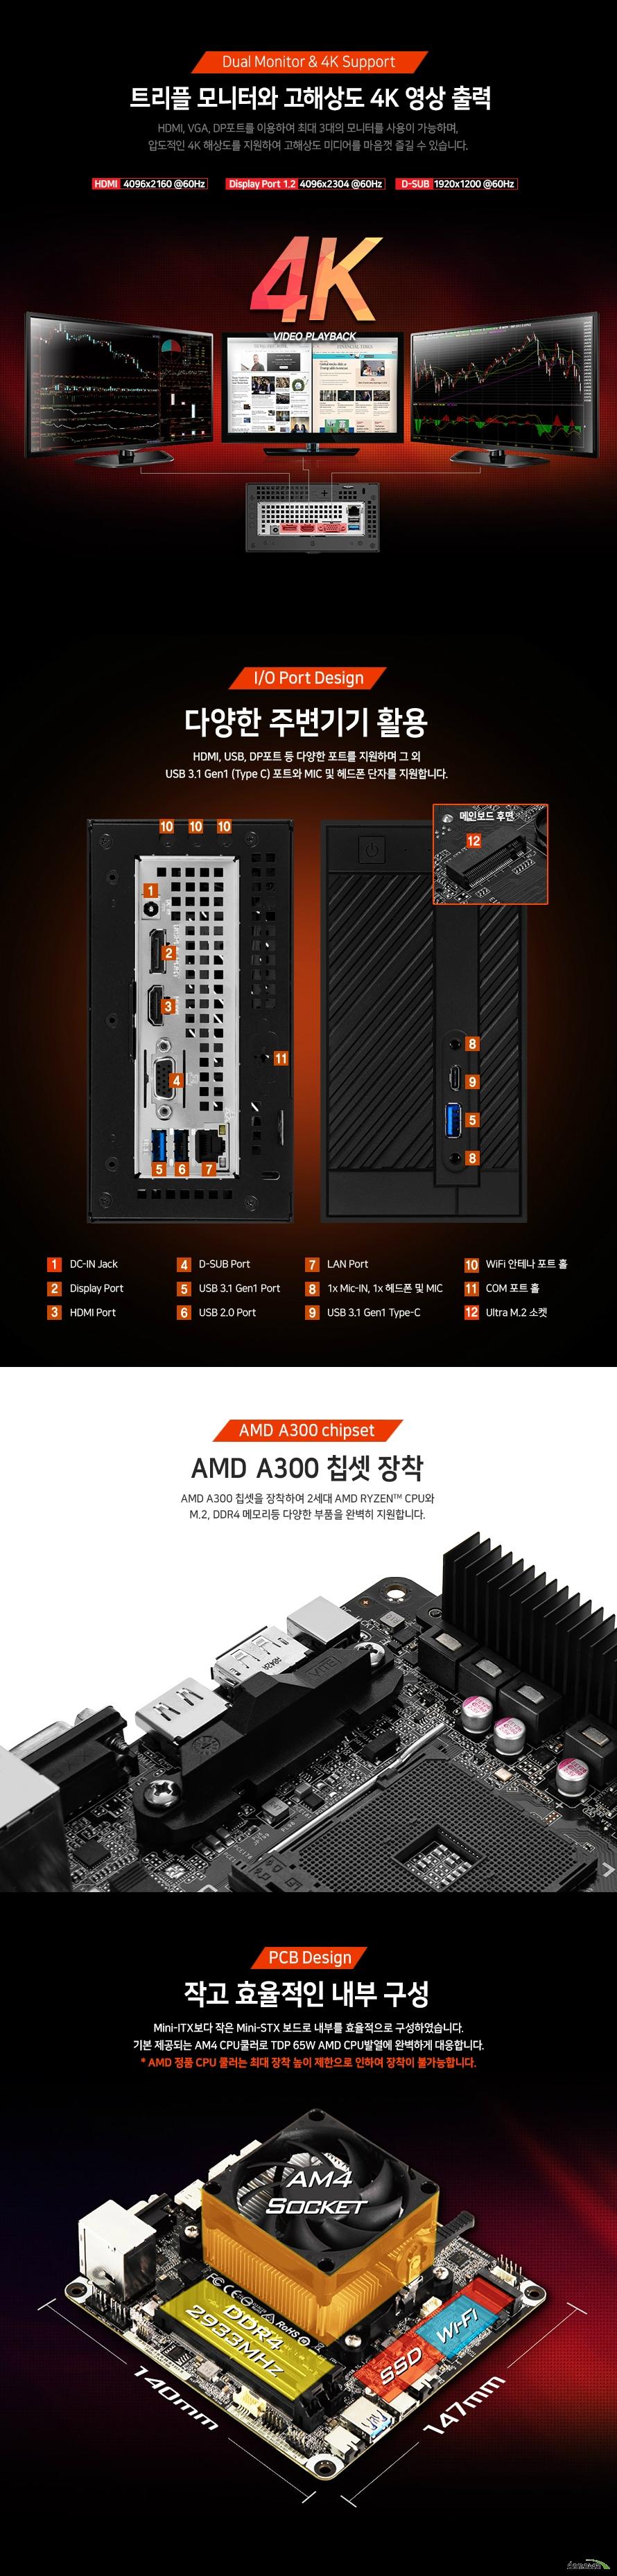 ASRock DeskMini A300 120W 에즈윈 (베어본)